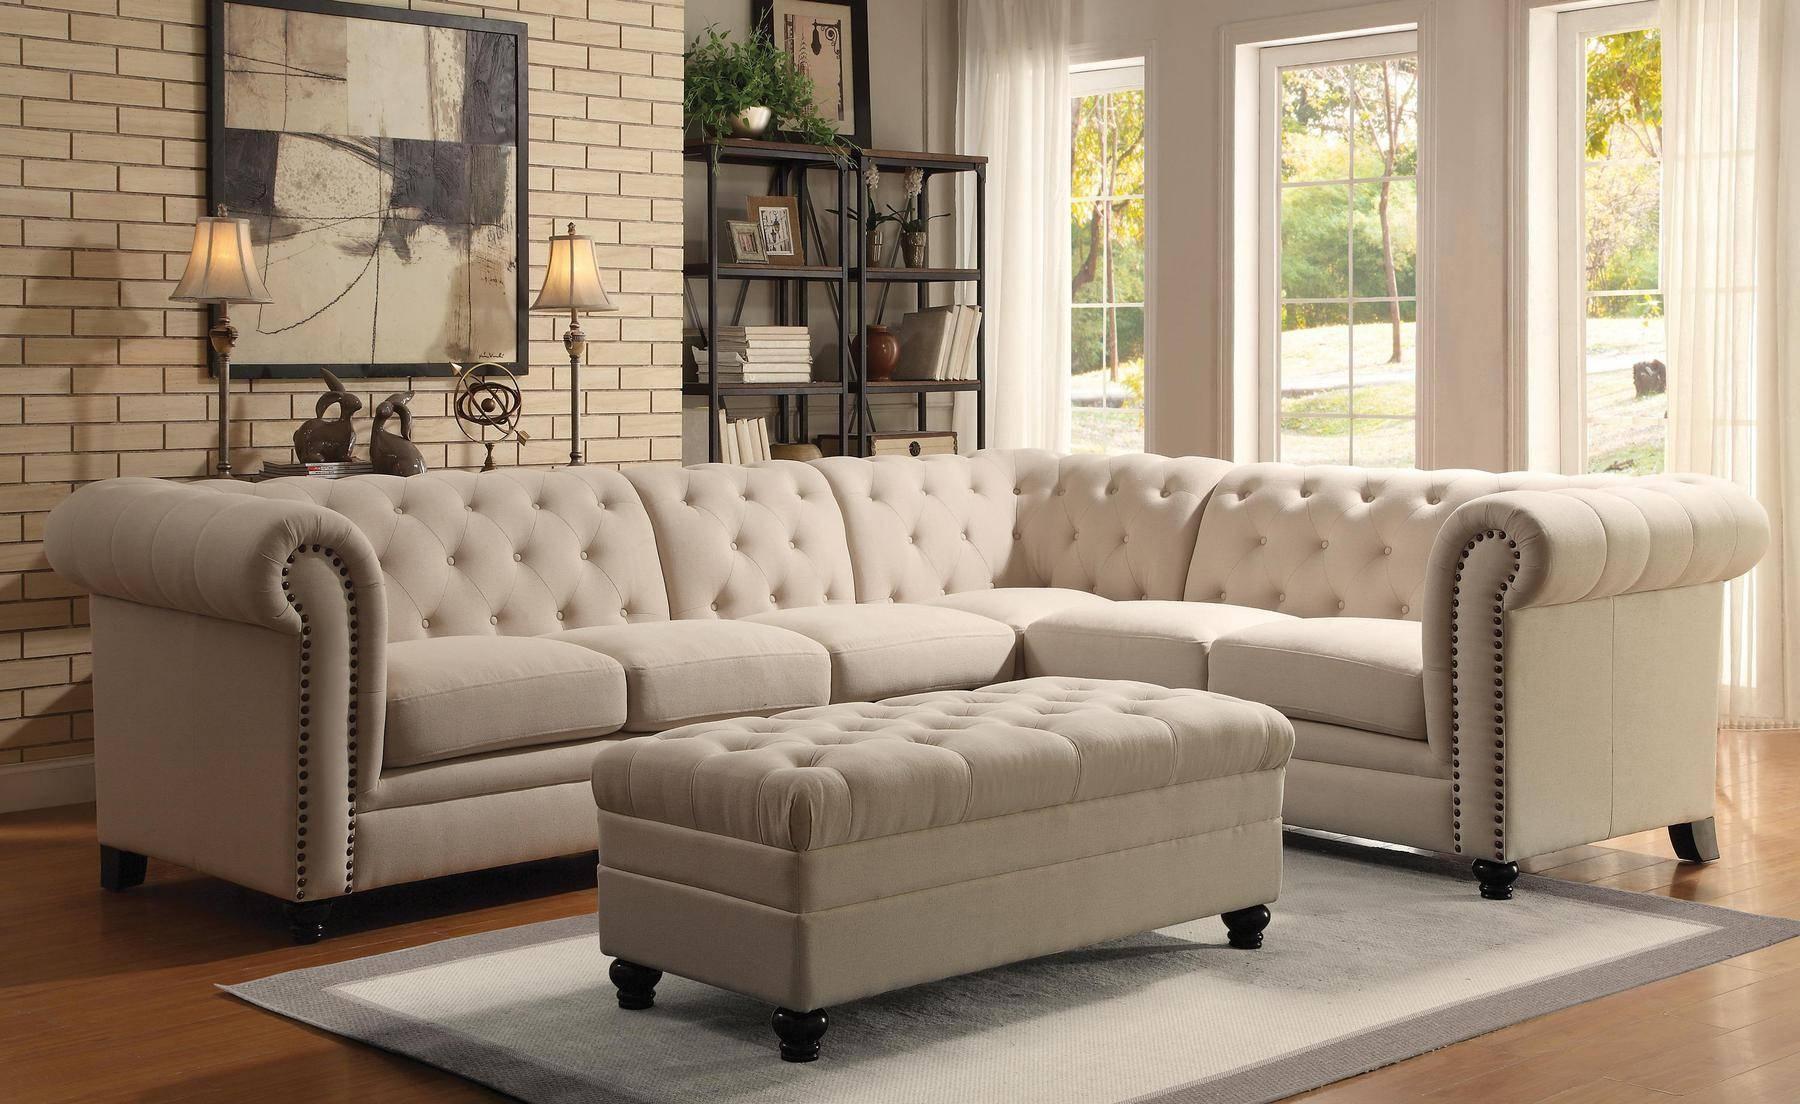 Roy Oatmeal Sectional Sofa 500222 Coaster Furniture Sectional in Armless Sectional Sofa (Image 23 of 30)